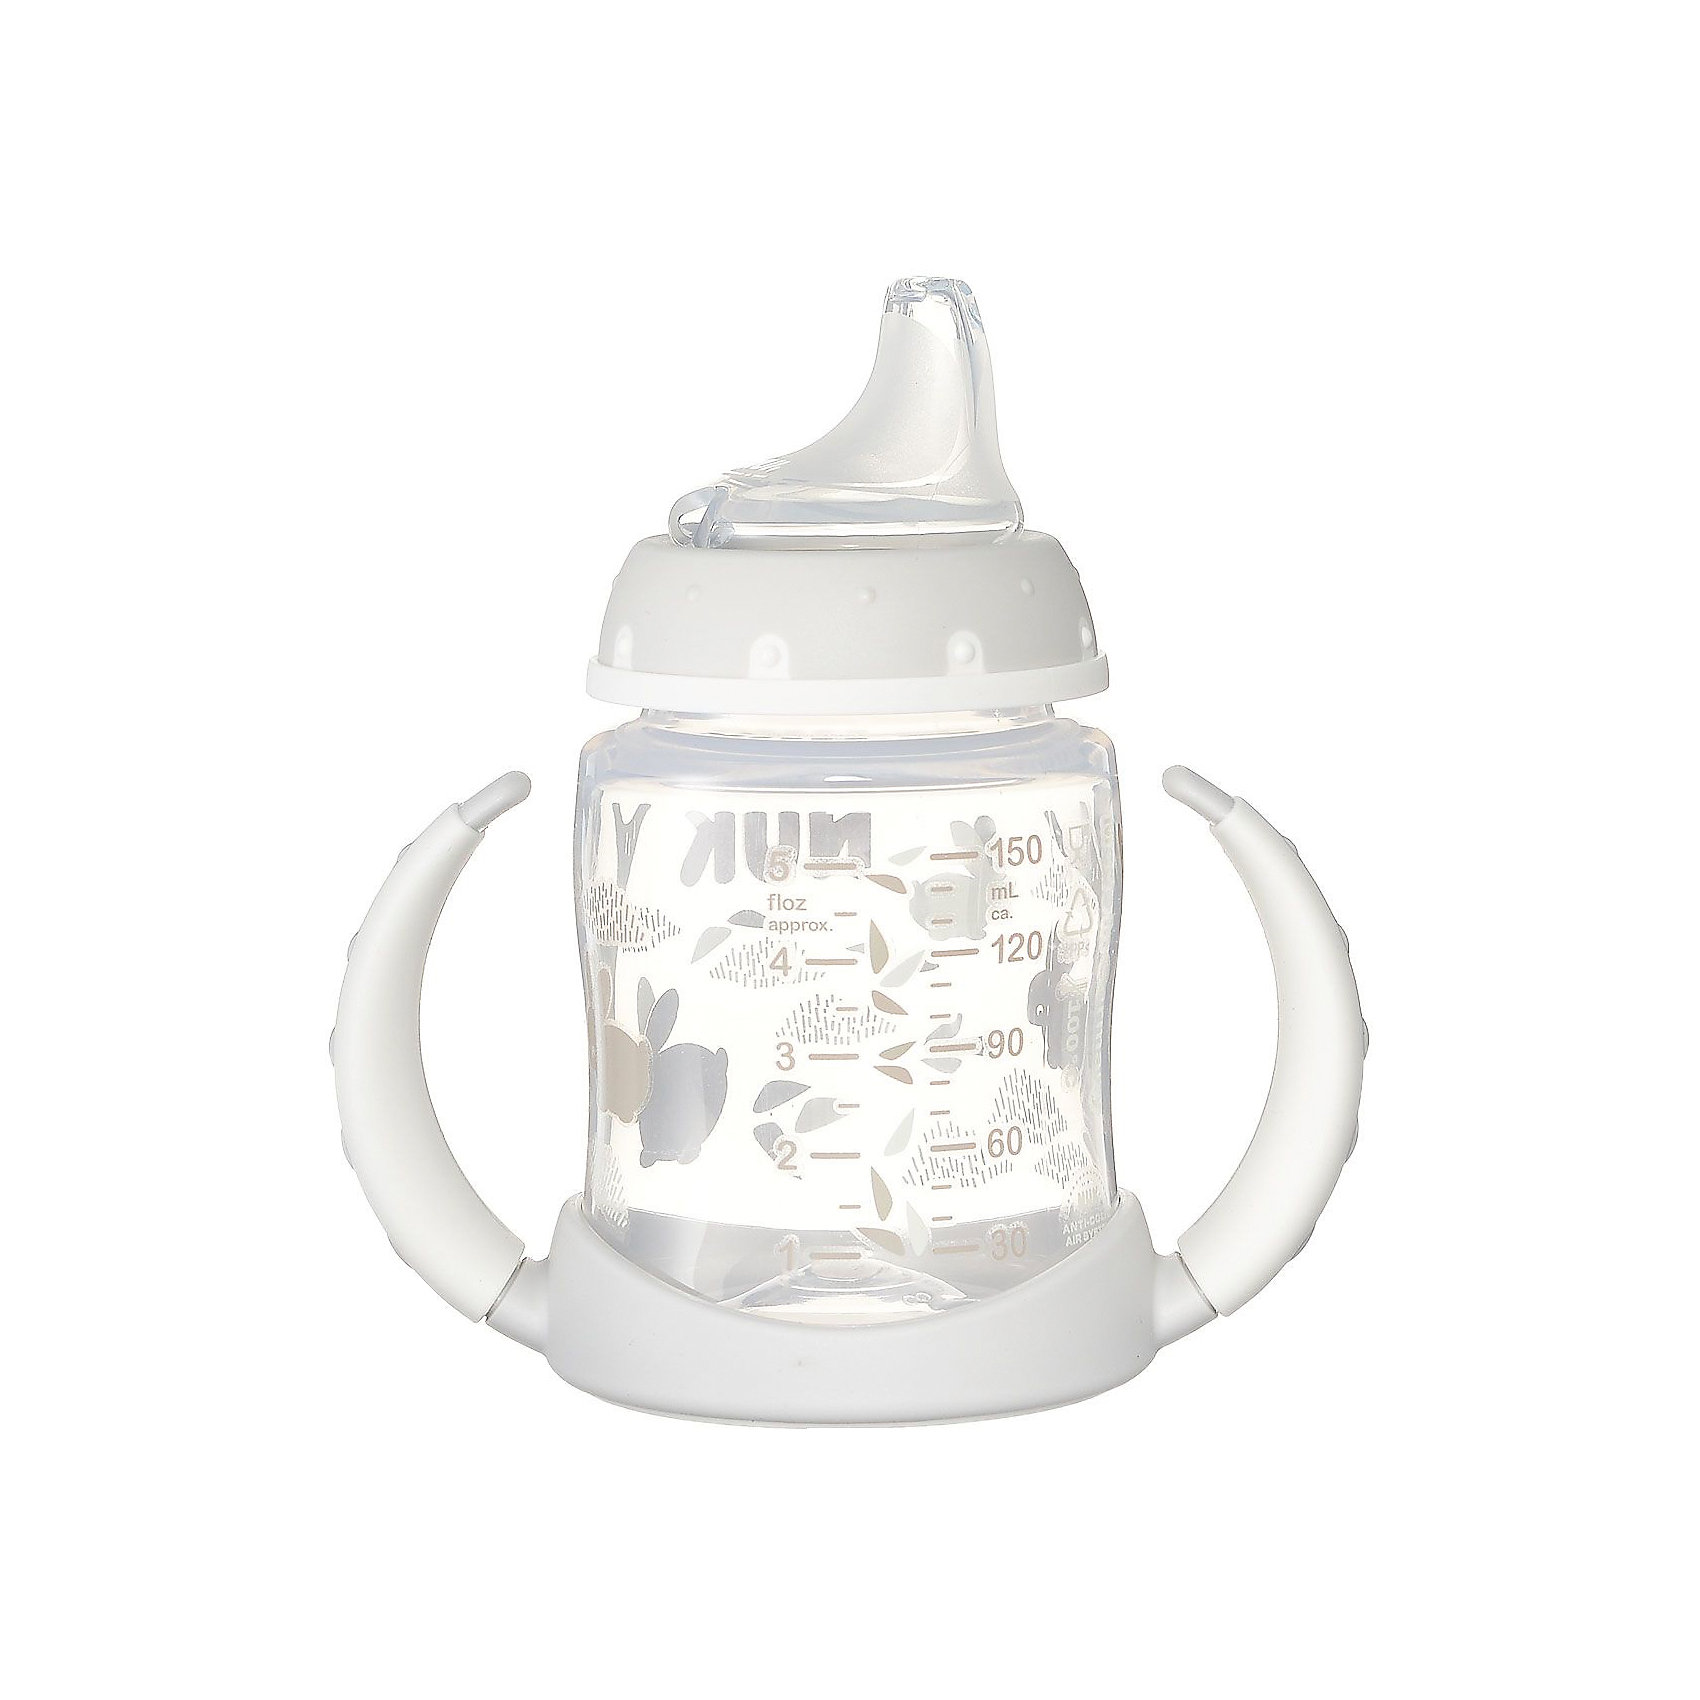 Бутылочка First Choice пласт. (ПП) 150 мл., NUK, белый